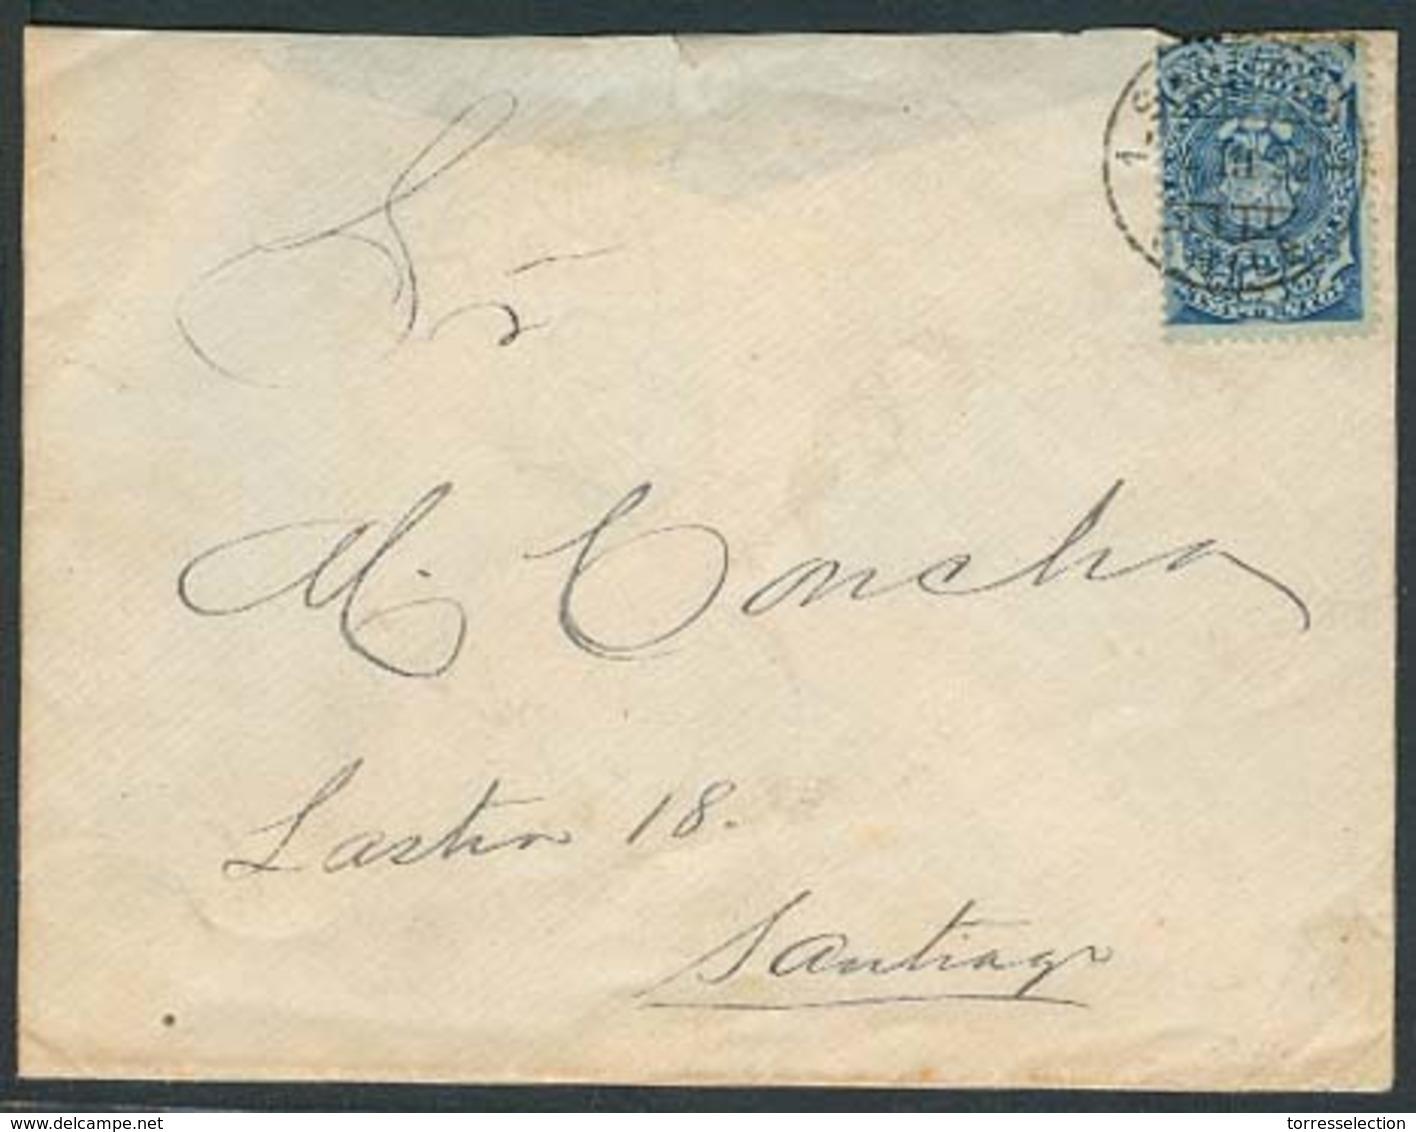 CHILE. 1892 (4 Marzo). Santiago Local Usage. Provisional Period / Postage Stamps Shortage / 5c Blue Impuesto Cds. Local - Chile